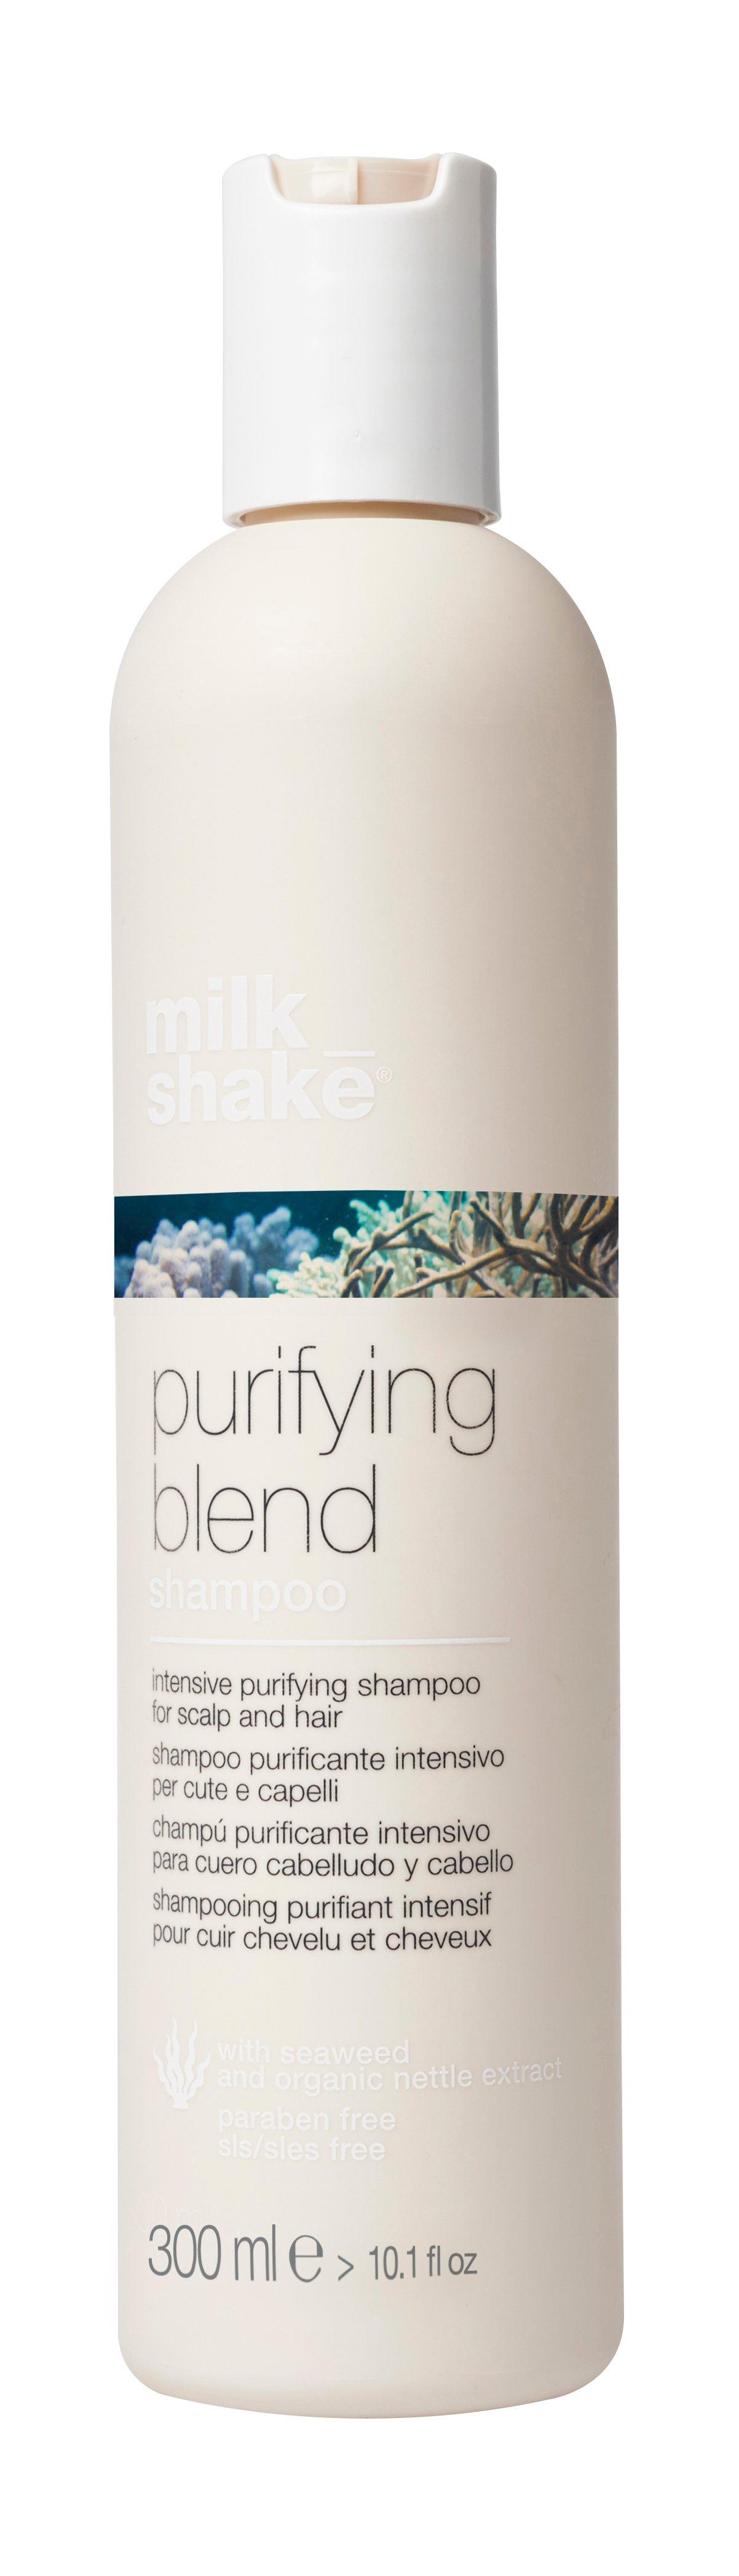 milk_shake - Purifying Blend Shampoo 300 ml